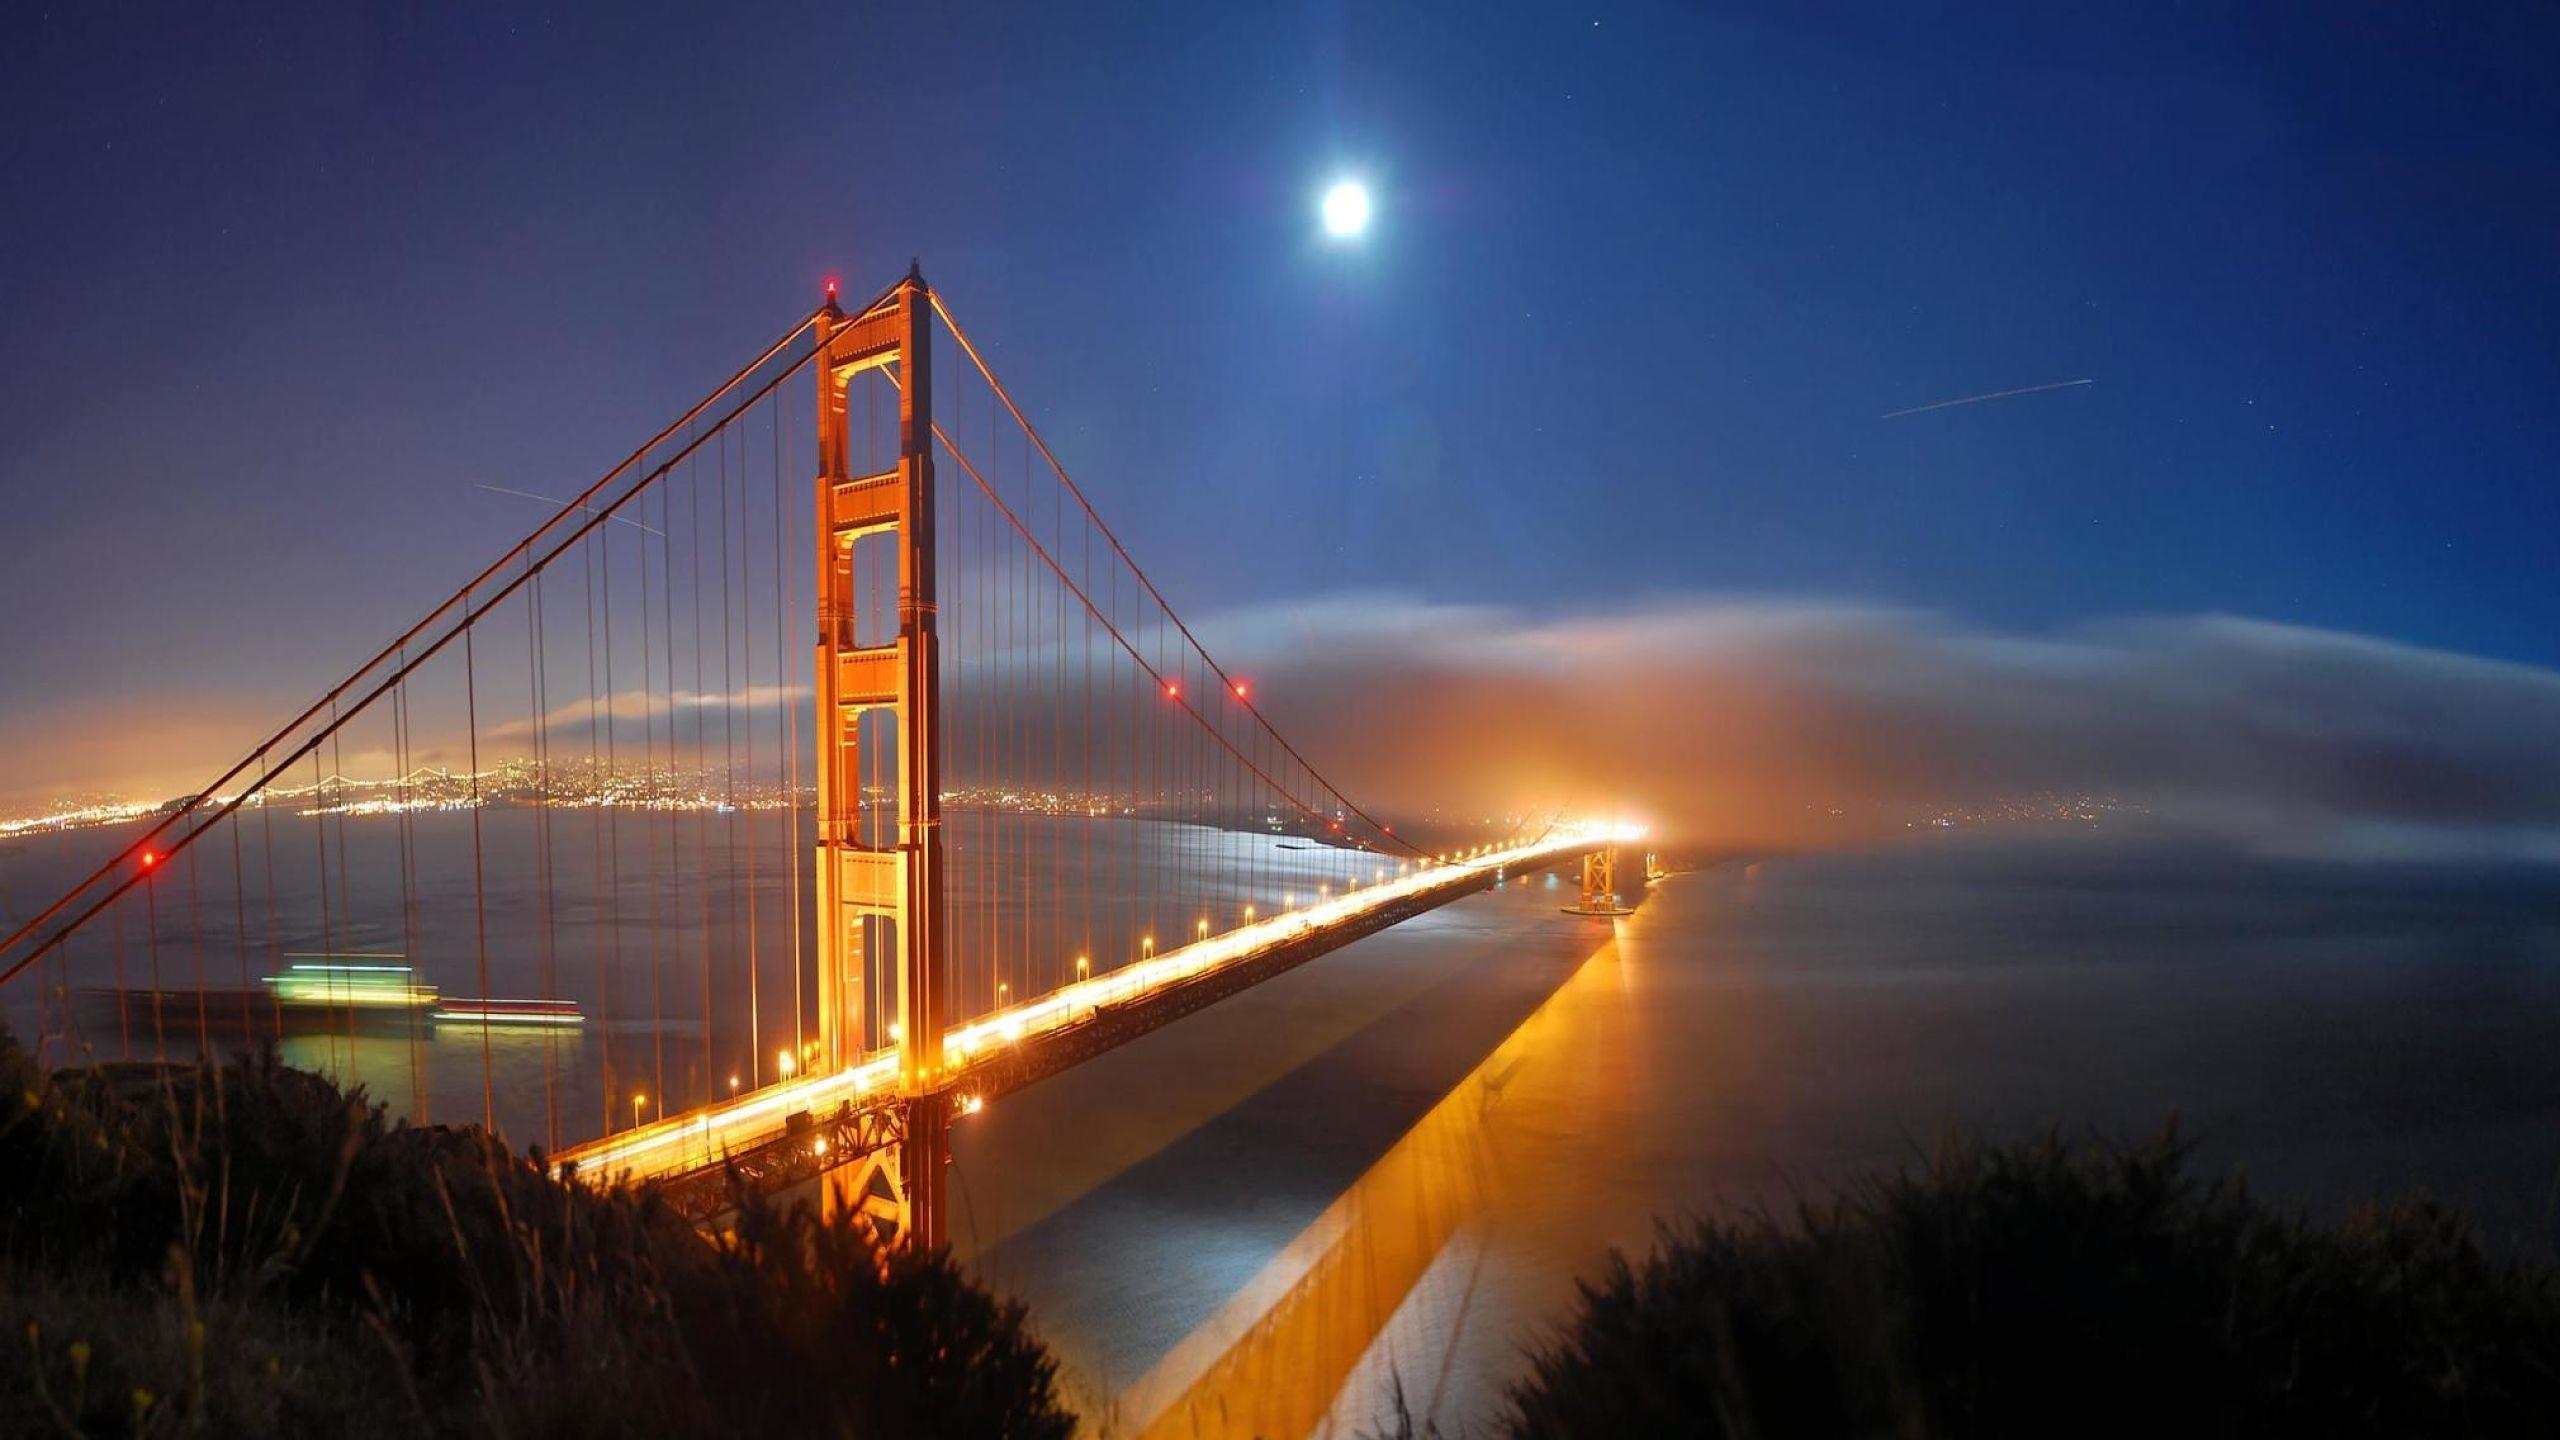 San Francisco Bridge Evening Dusk Sunset wallpapers